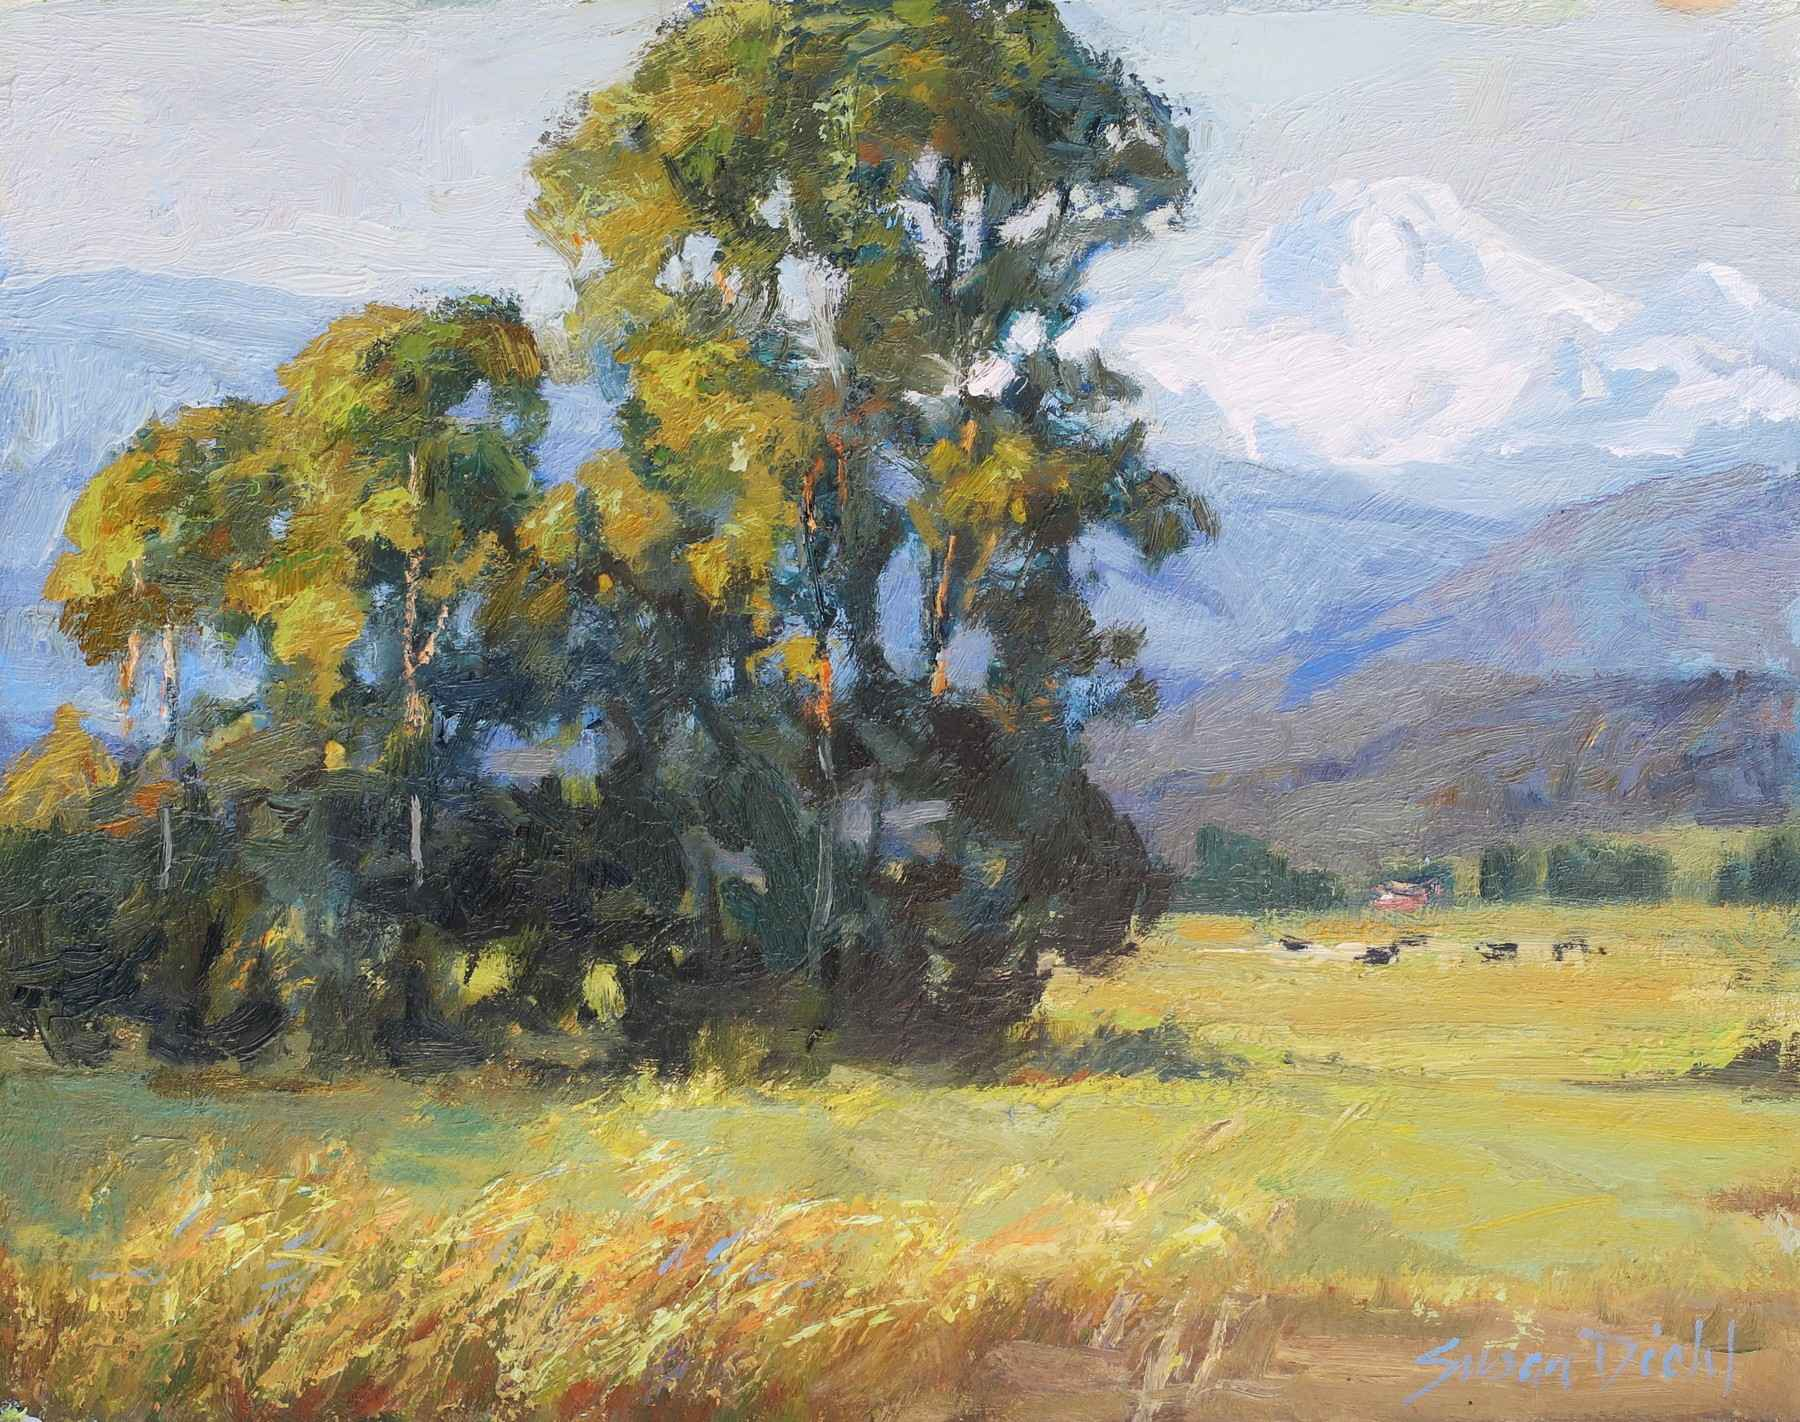 A Day in the Valley by  Susan Diehl - Masterpiece Online